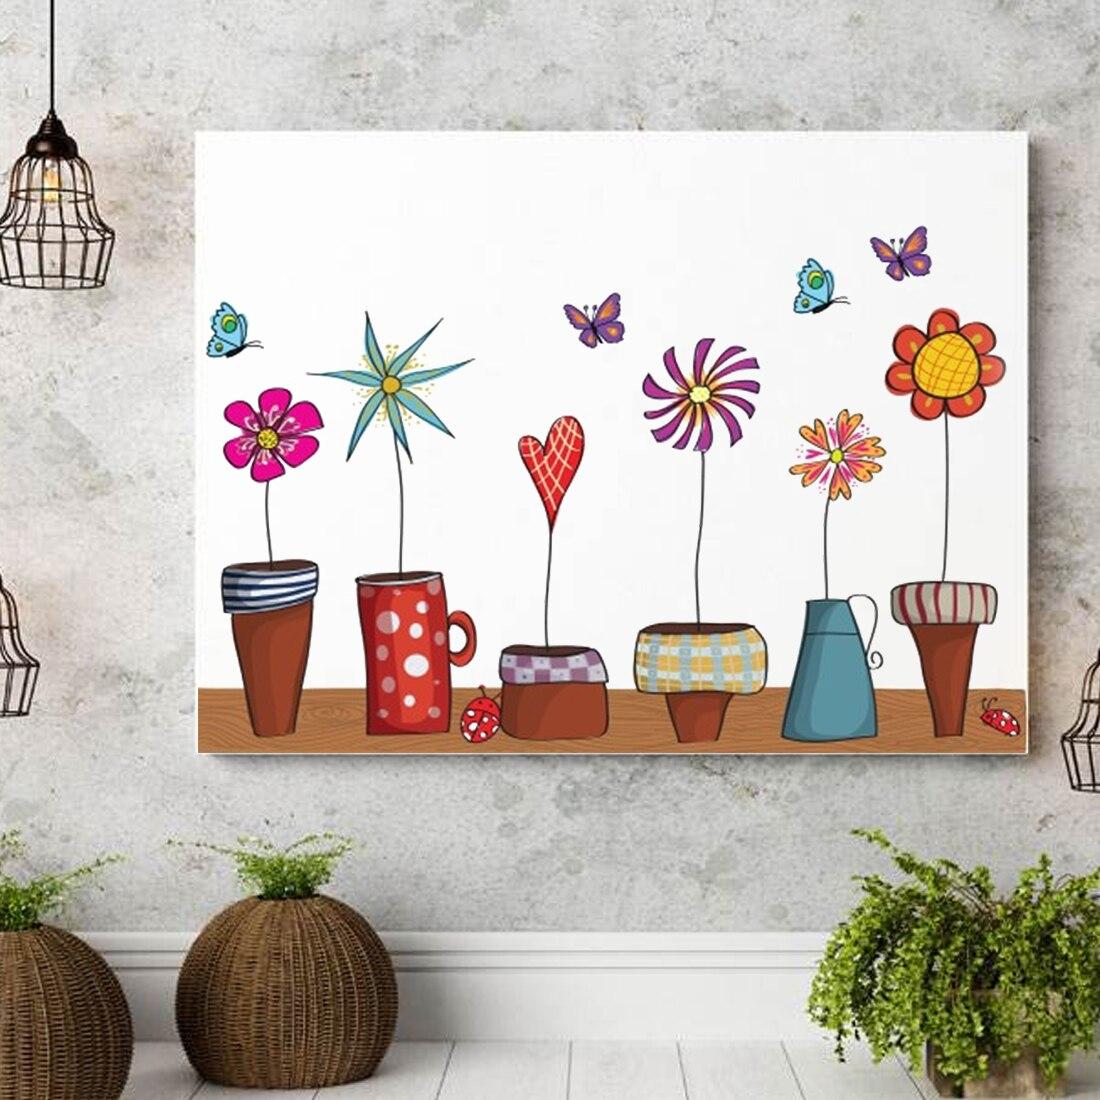 Cute Home Decor: Cool Cute Flower Wall Sticker Kitchen Window Sticker